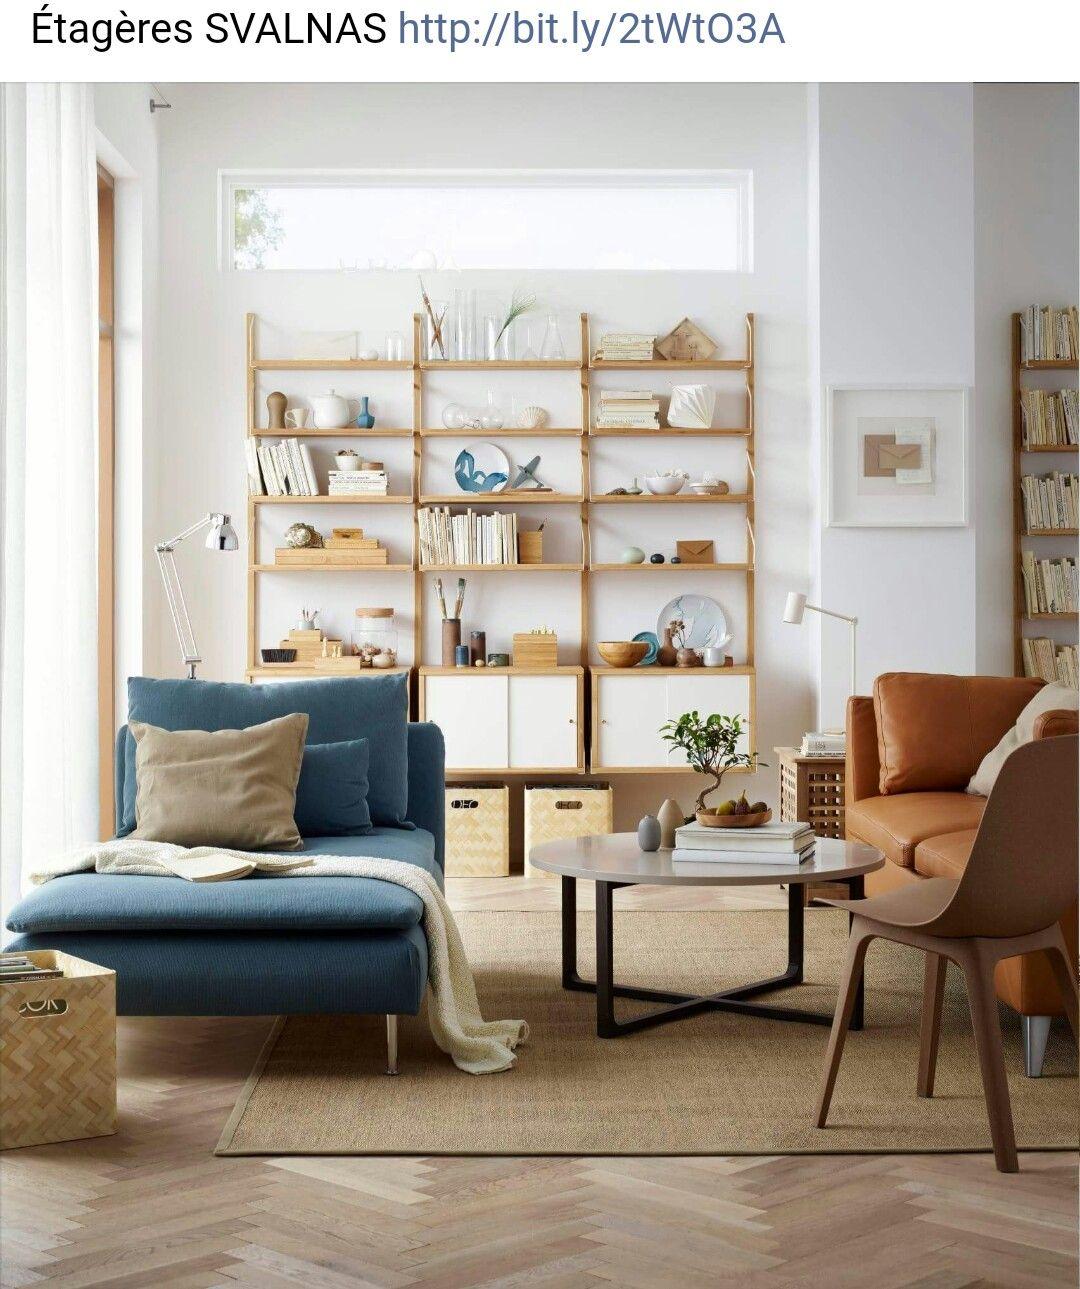 Ikea Uk Living Room Furniture: Étagères SVALNAS Ikea